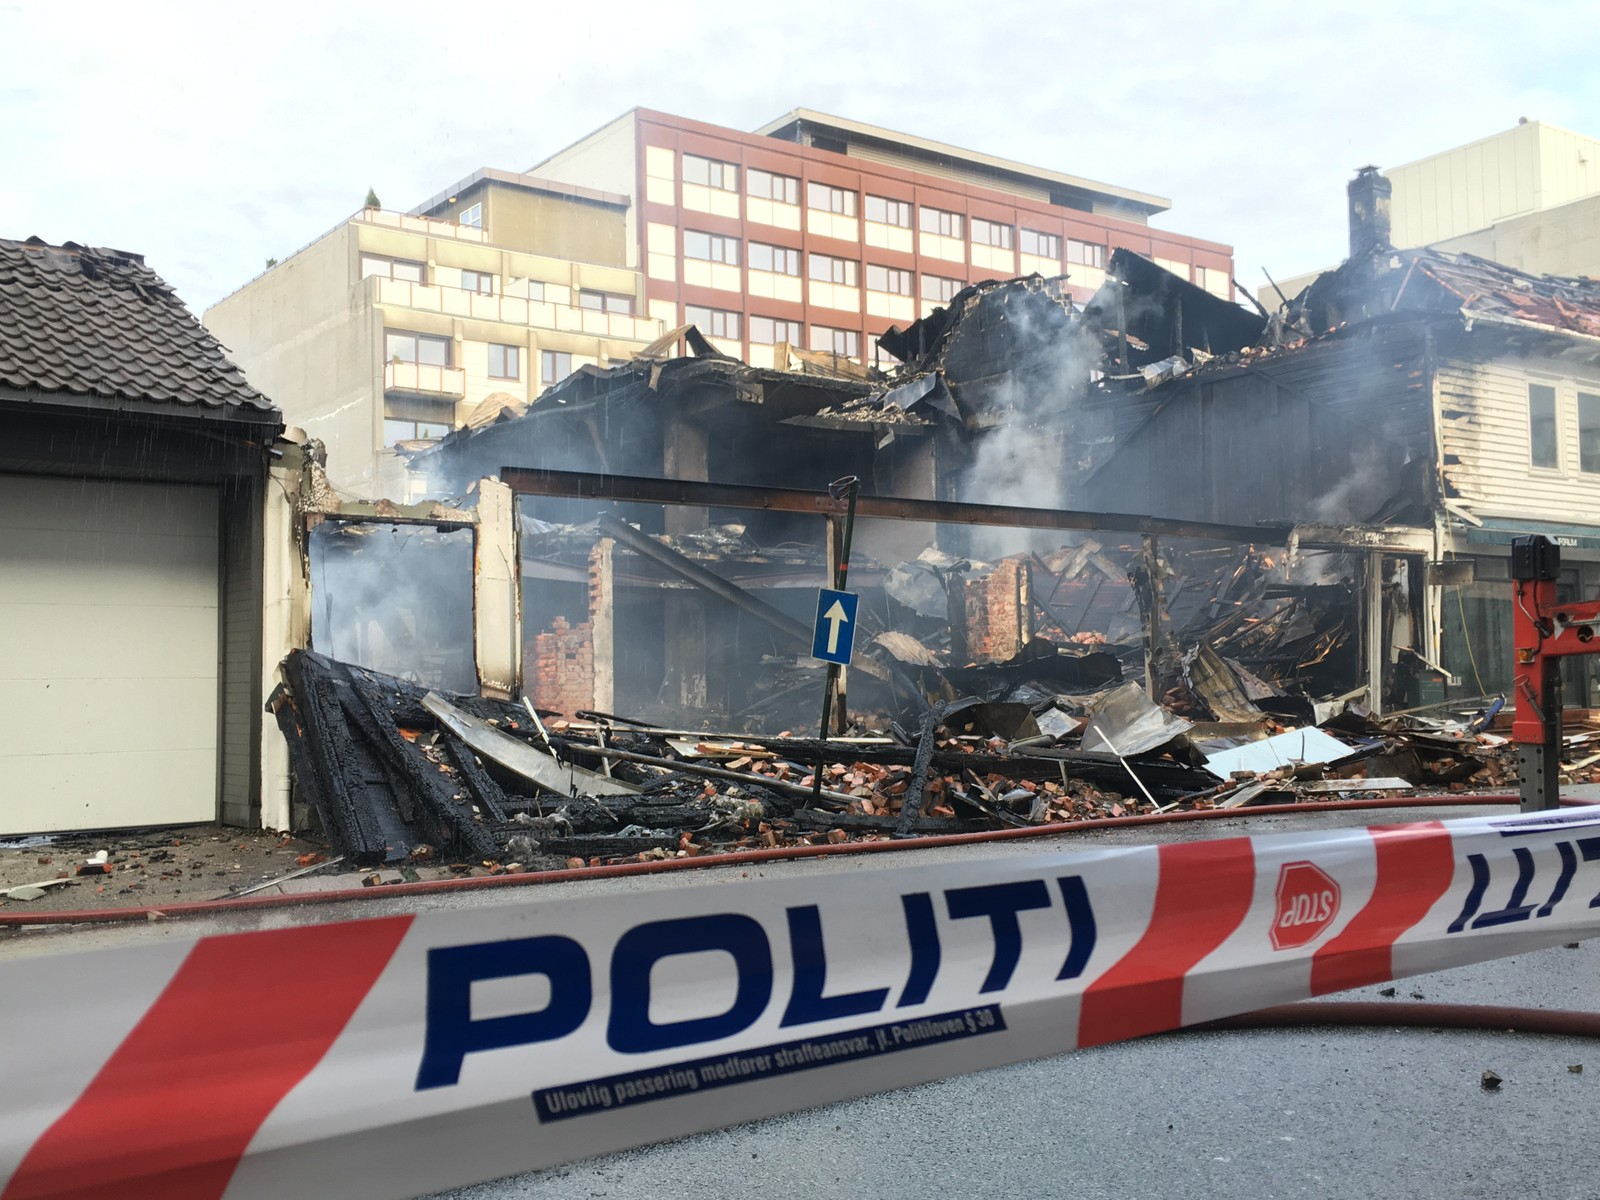 Politibånd sperrer branntomt i Henrik Wergelands gate